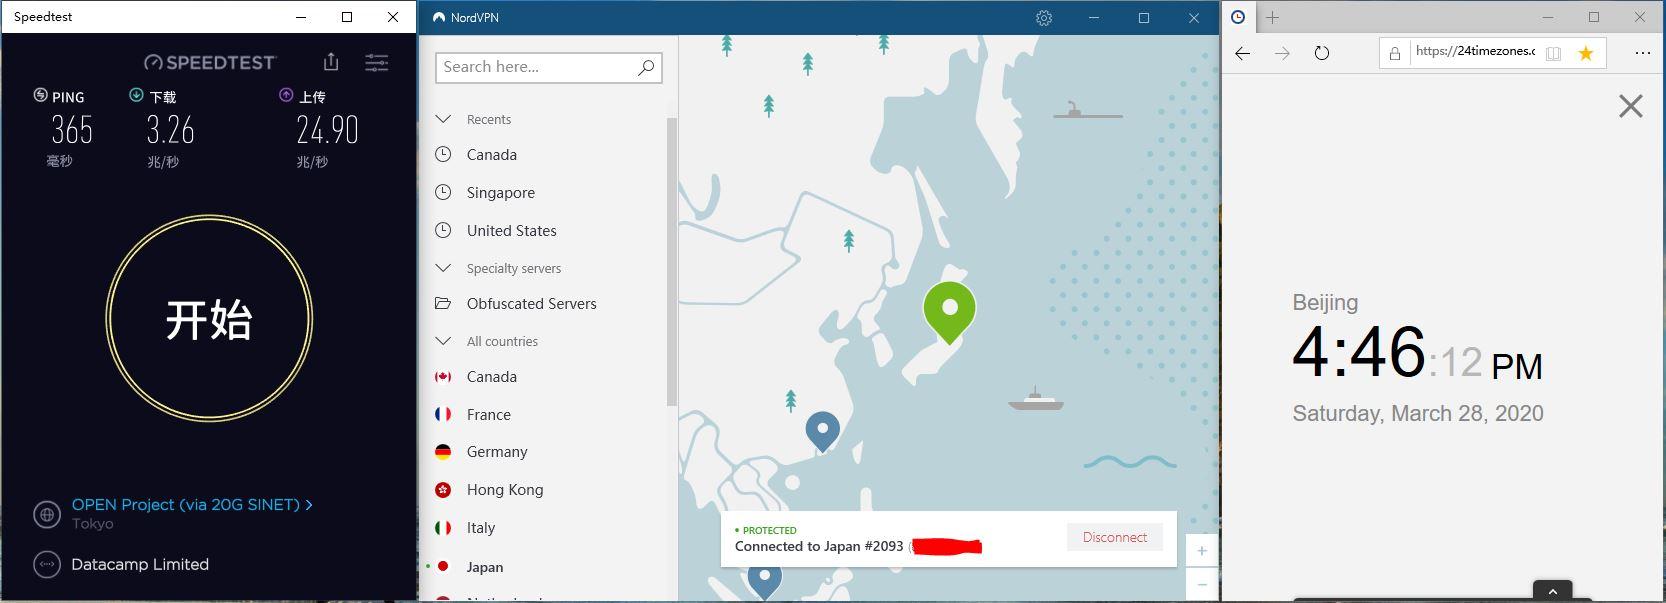 Windows10 NordVPN Japan #2093 中国VPN翻墙 科学上网 Speedtest测速 - 20200328